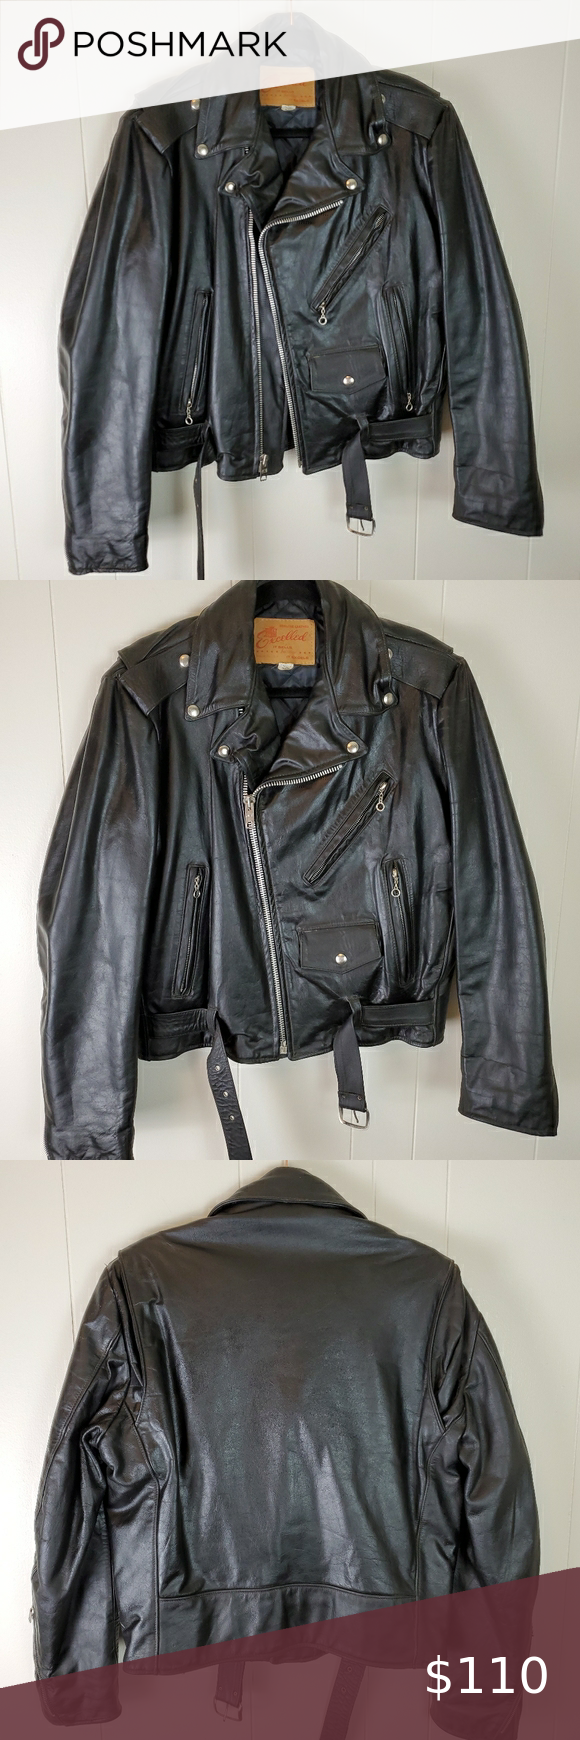 Vintage Excelled Genuine Leather 38r Motorcycle Ja Leather Clothes Design Genuine Leather [ 1740 x 580 Pixel ]